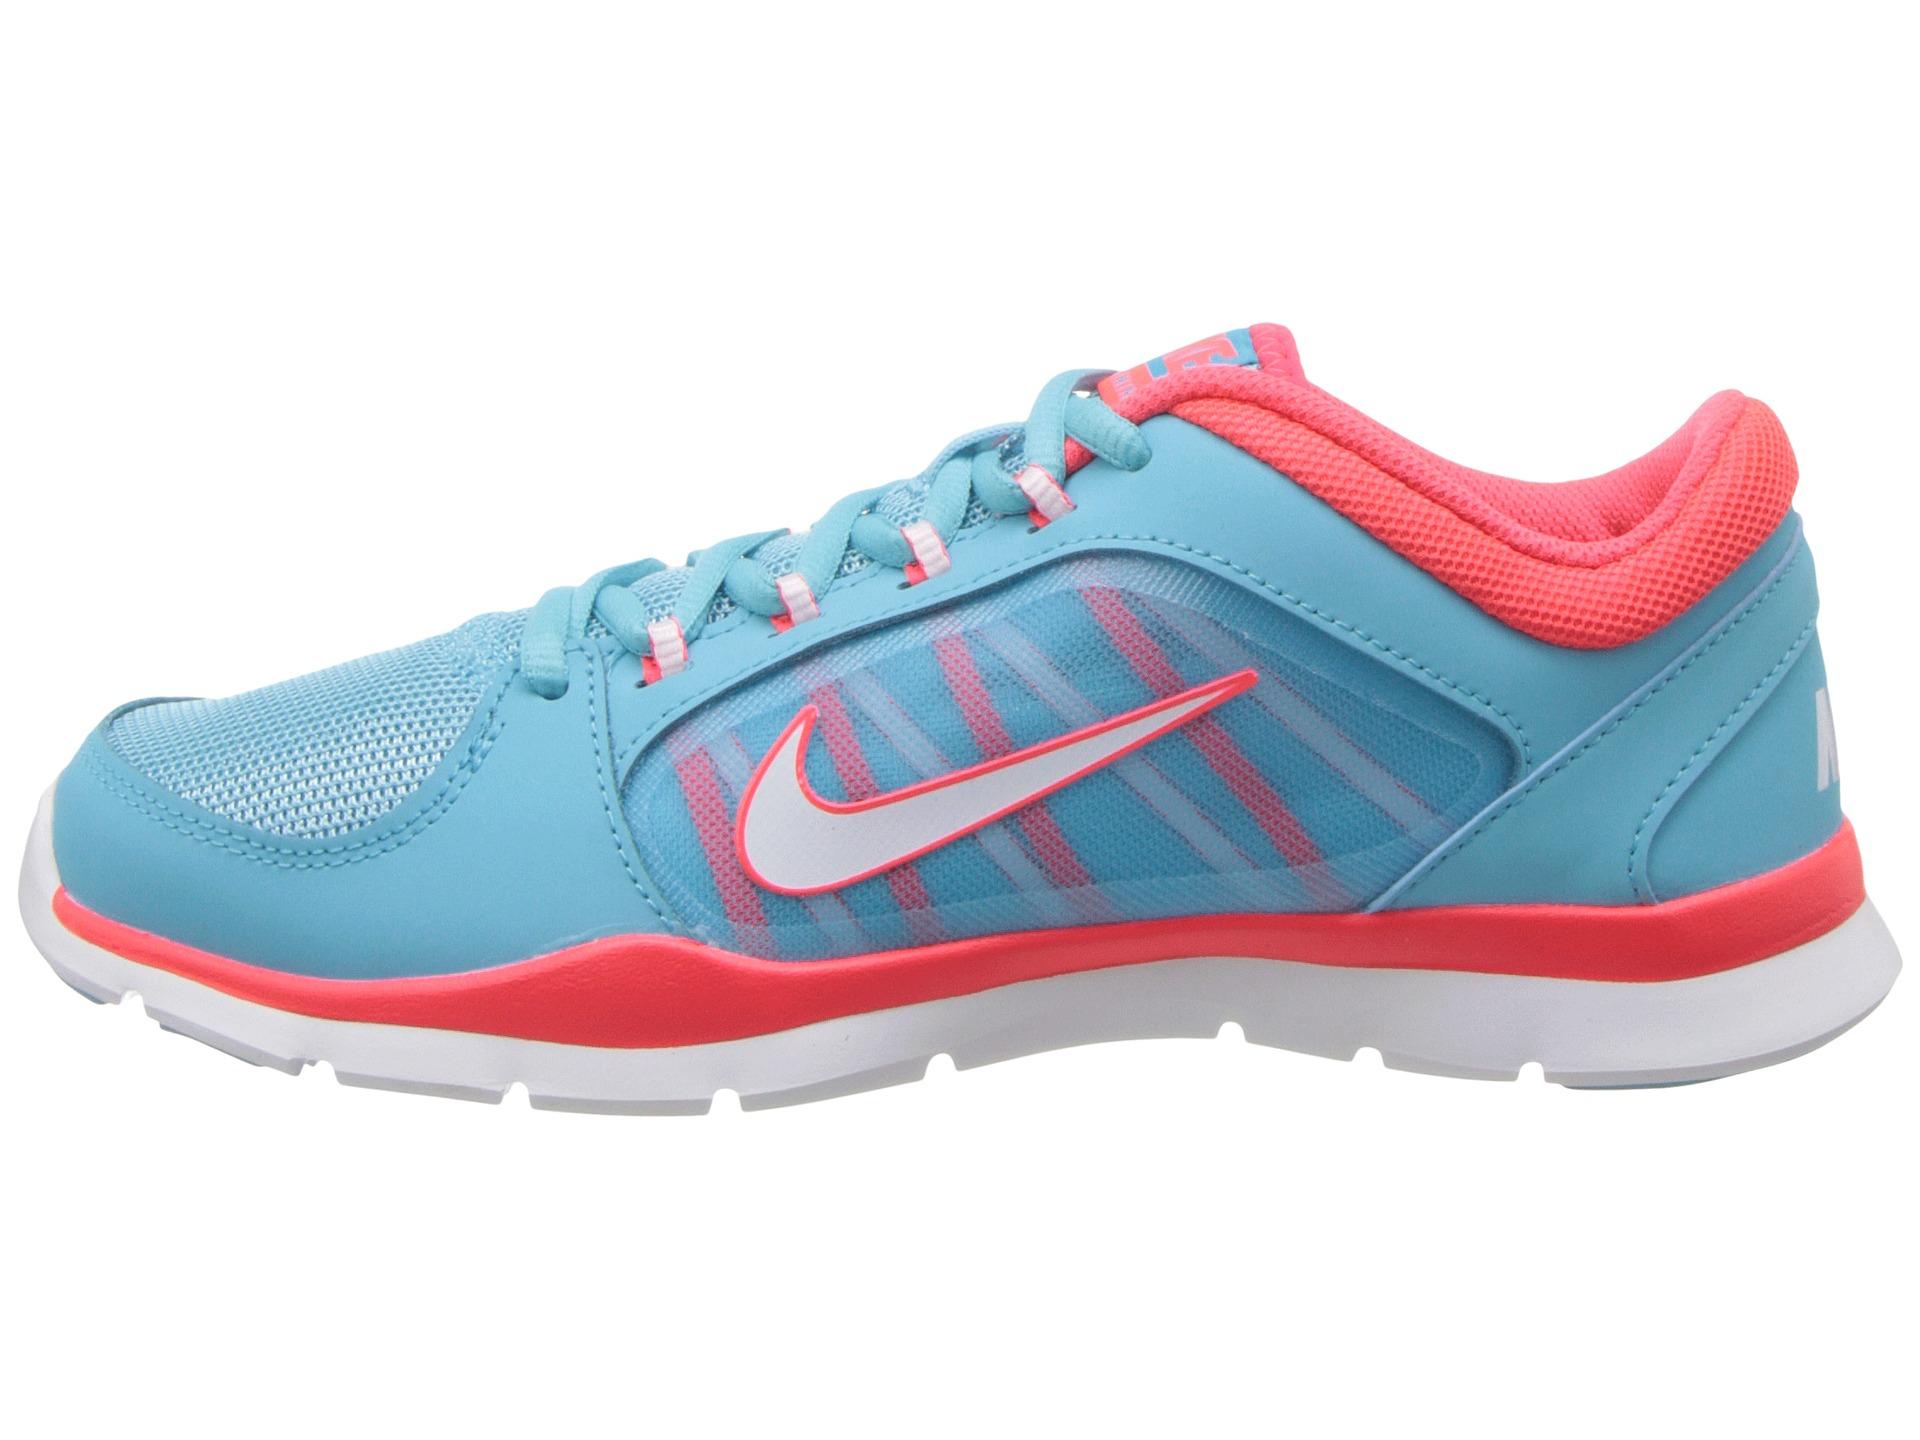 3ad685941bda Nike Nike Air Pegasus 29 Womens Cushioned Running Shoes in B ..